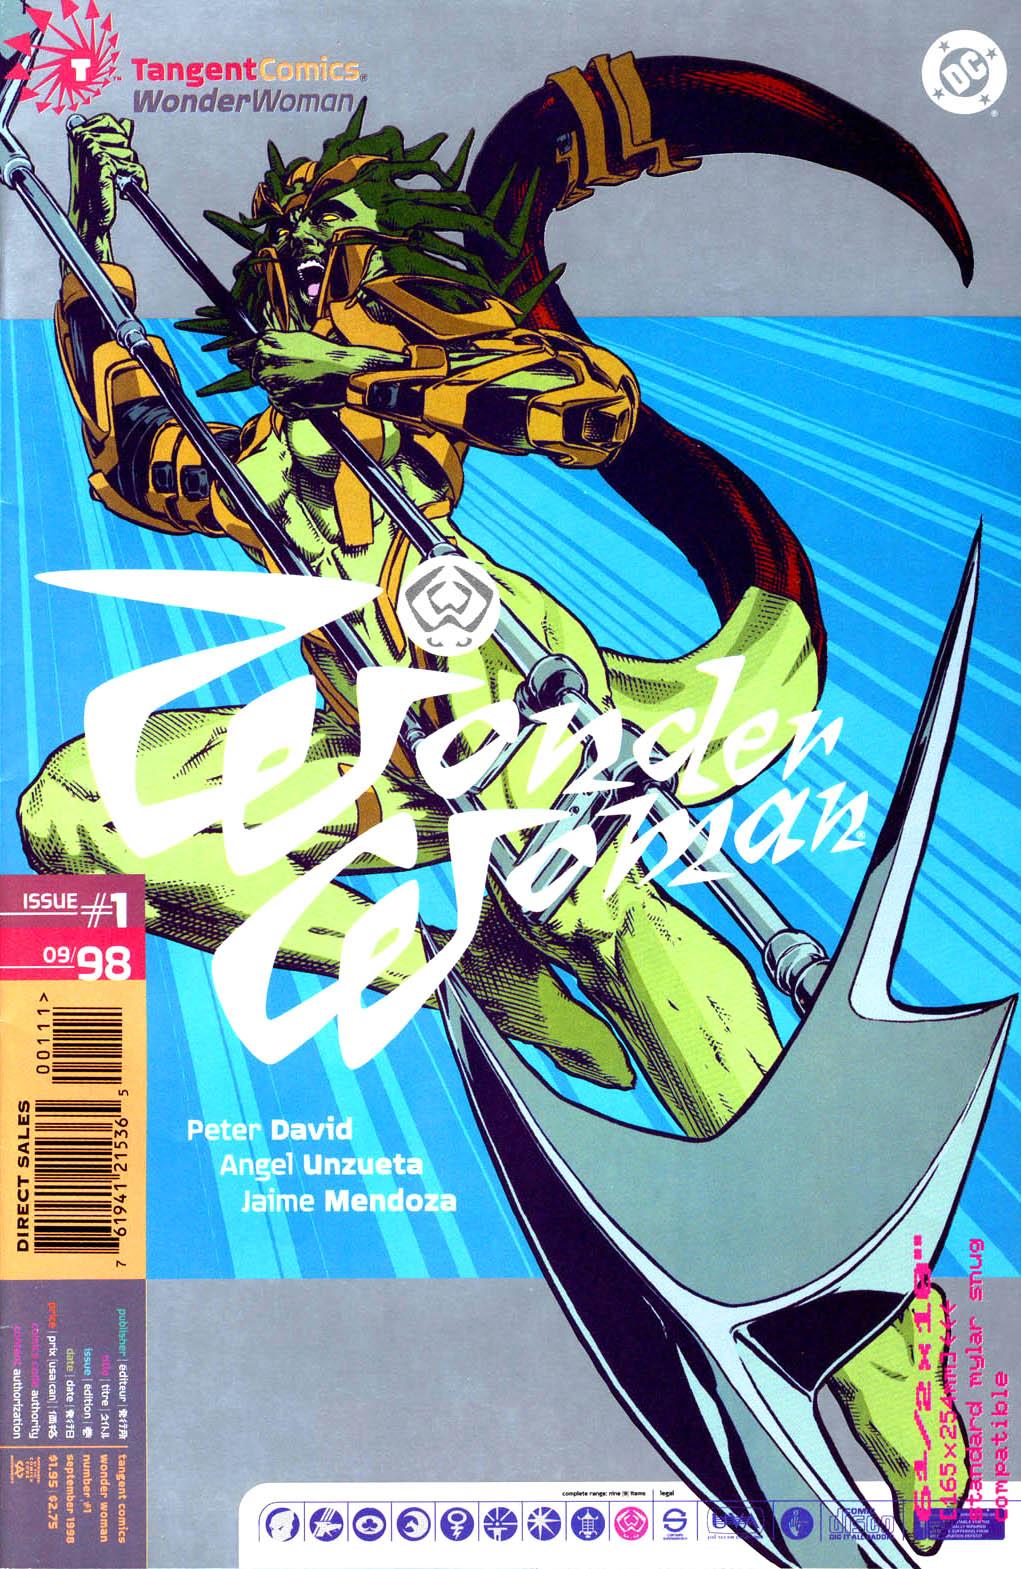 Read online Tangent Comics/ Wonder Woman comic -  Issue # Full - 1